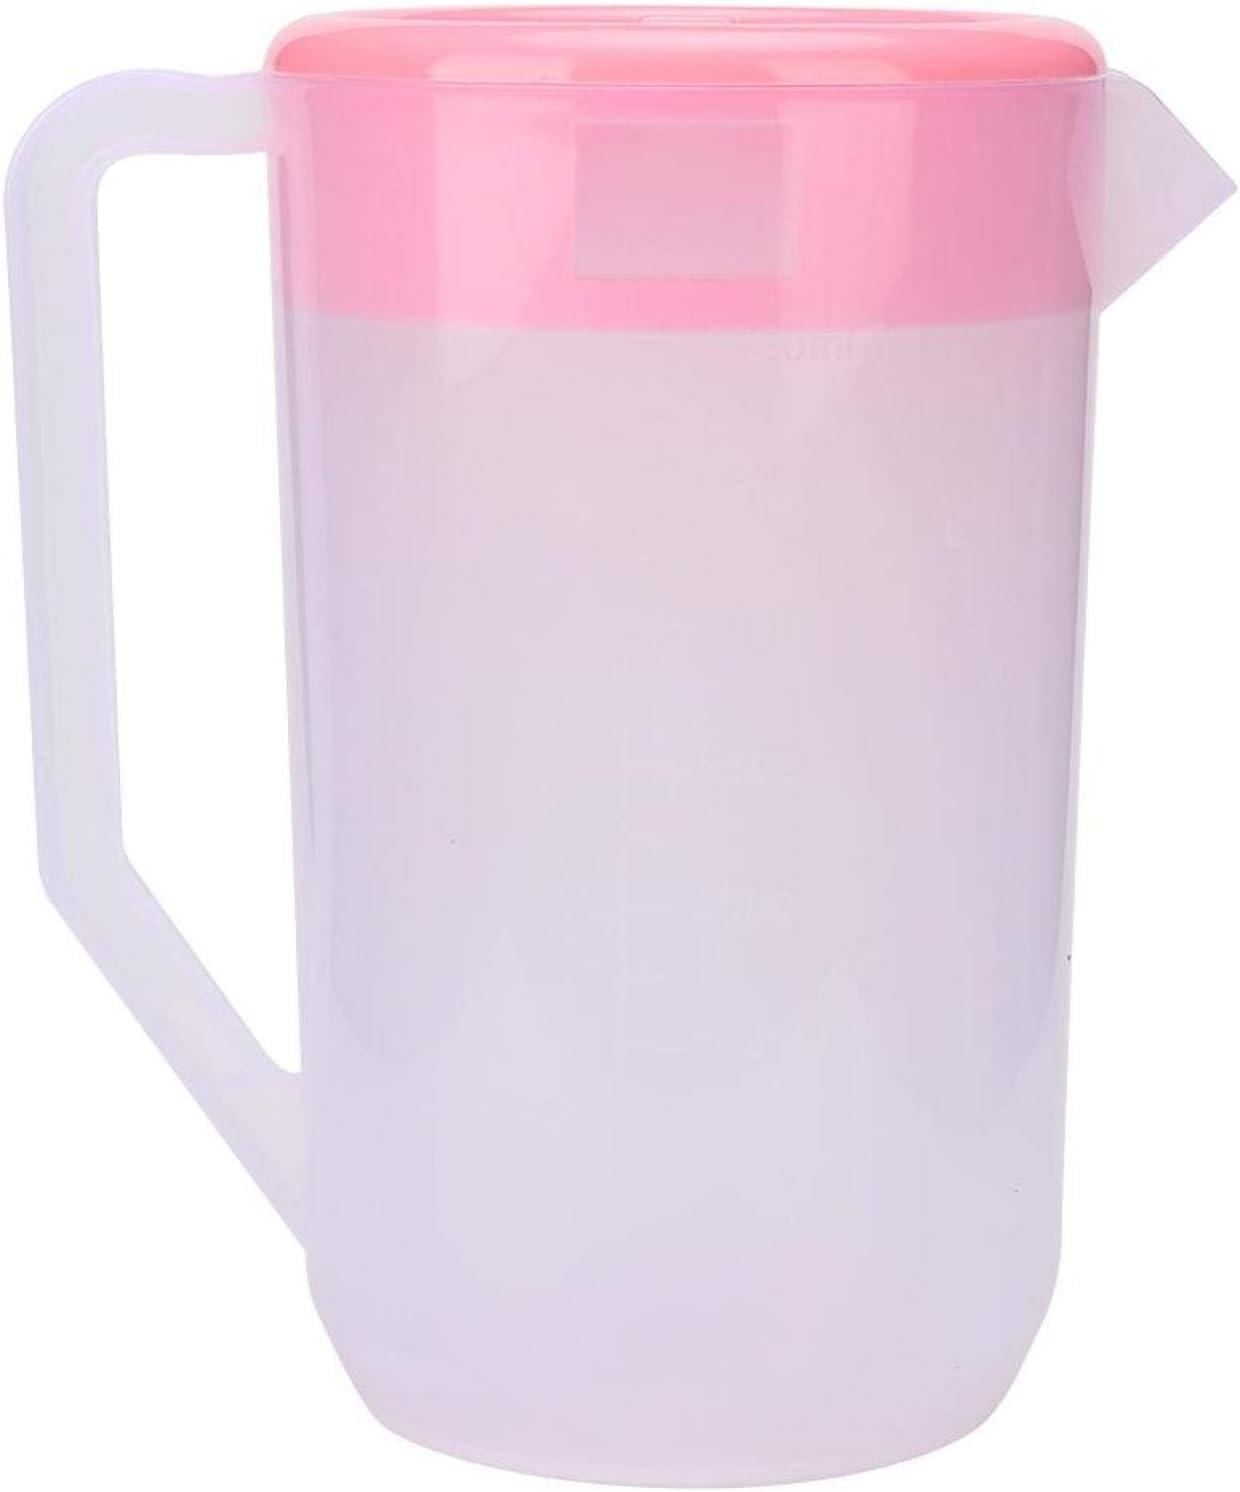 Buachois High order List price 4000ml Large Capacity Water Bottle Reusable Col Plastic